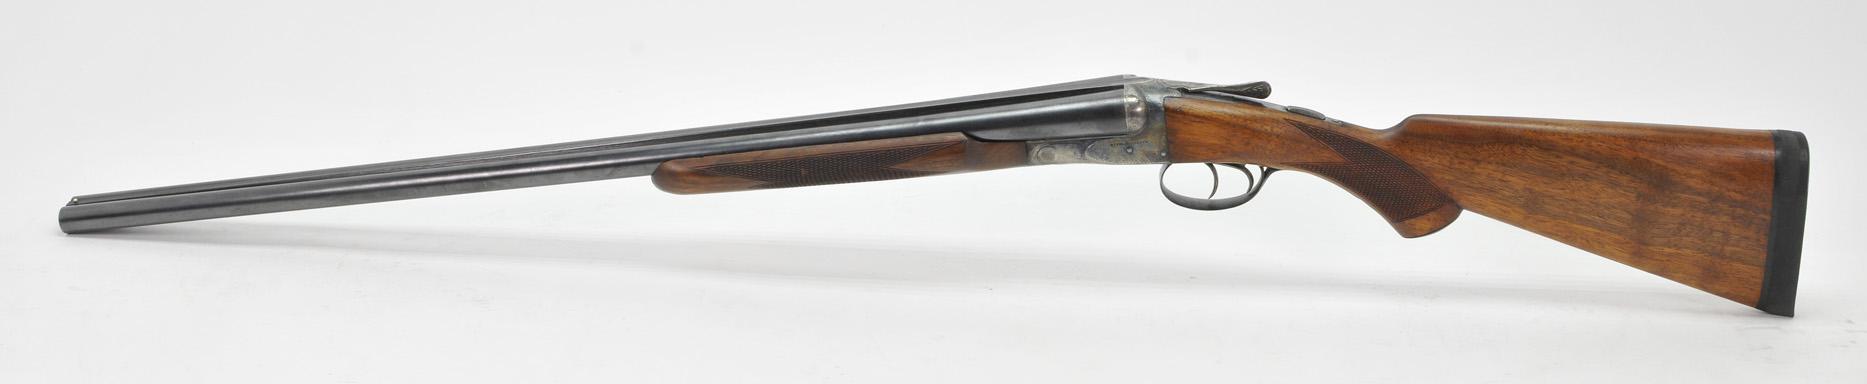 Fox Sterlingworth custom shop inc